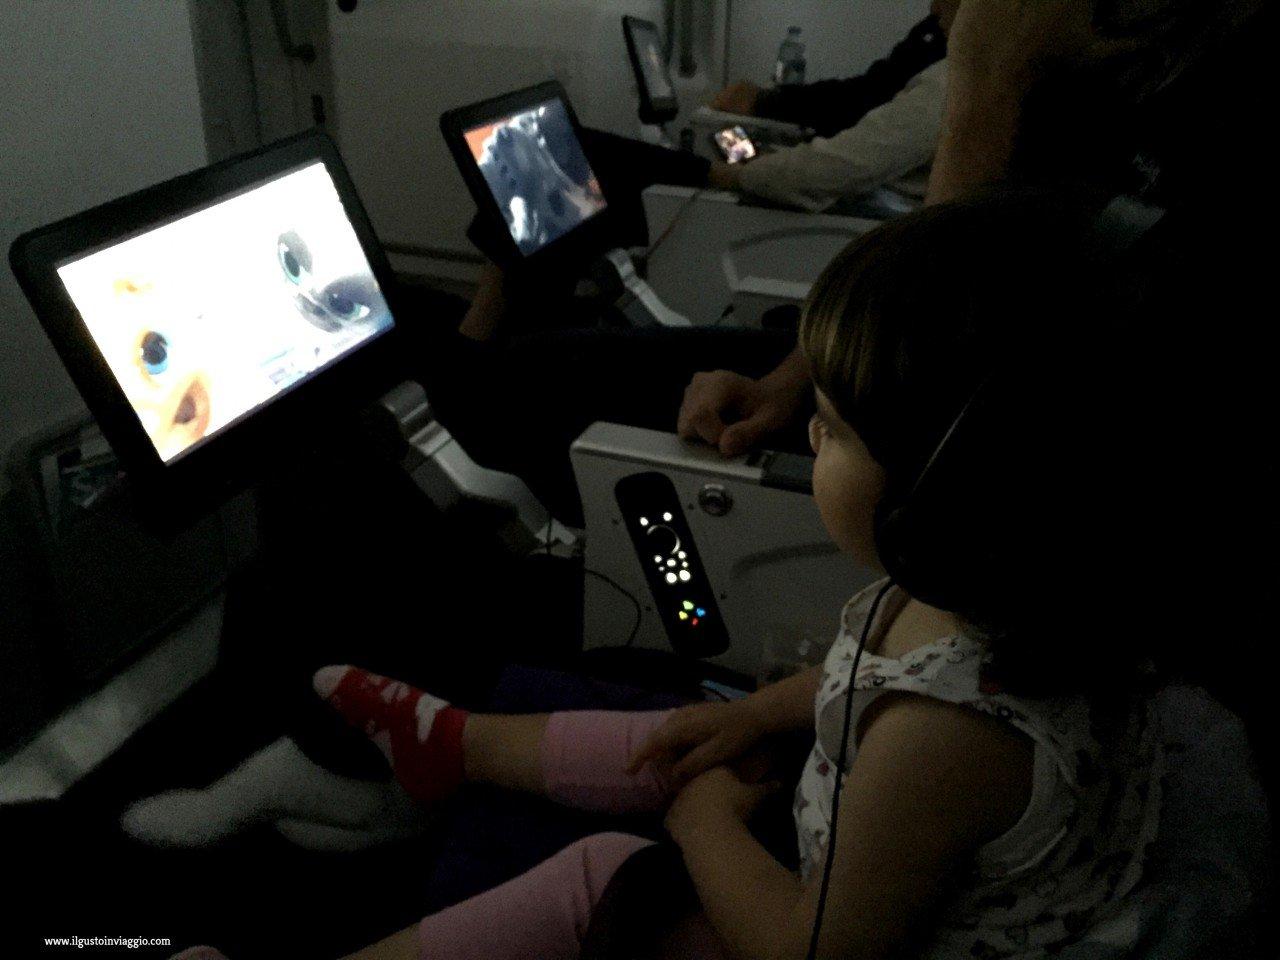 thai airways e bambini, thai airways intrattenimento